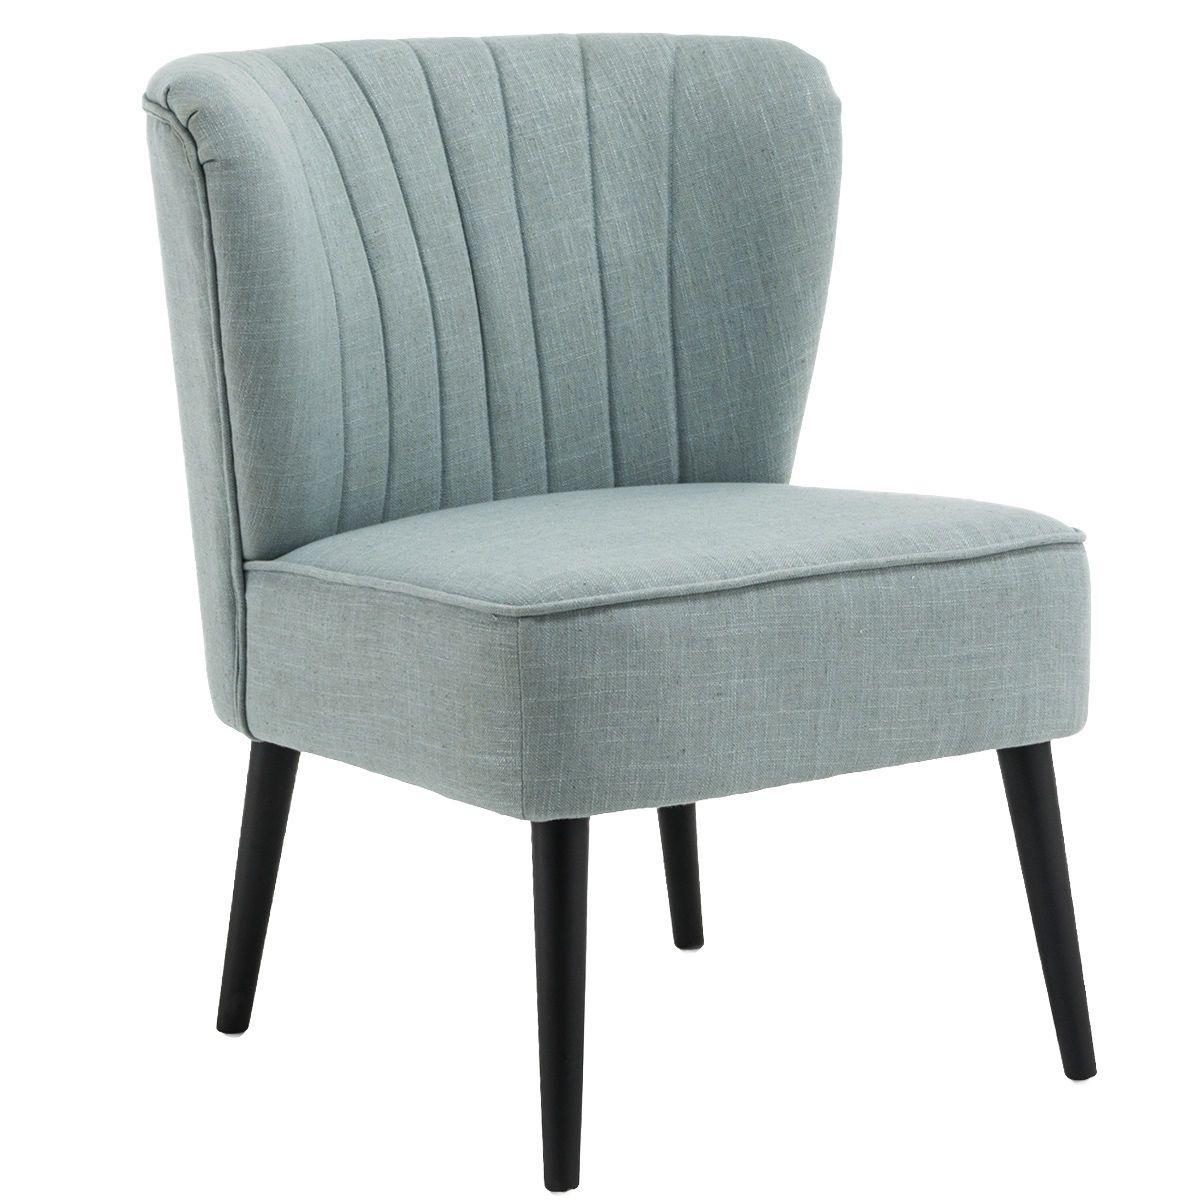 Miavilla Sessel Charlotte Furniture Pinterest Sessel